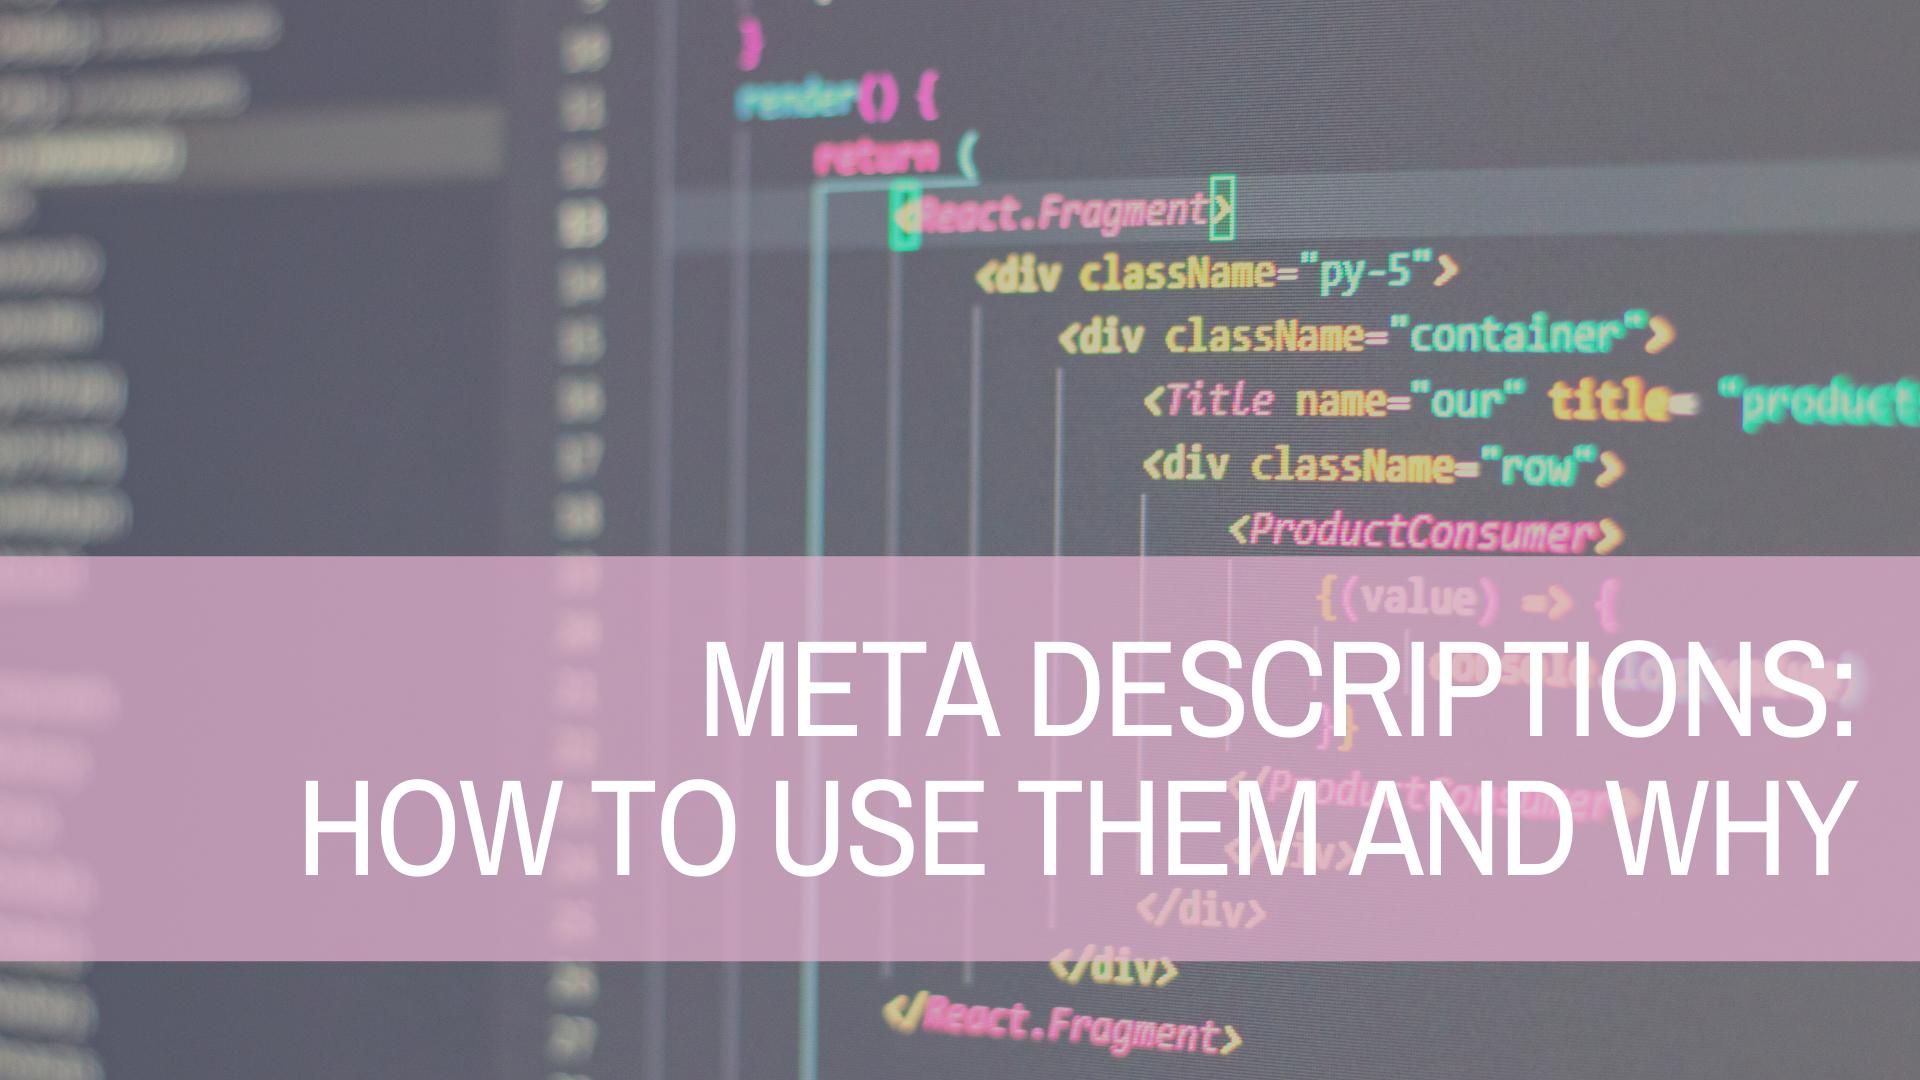 Are Meta Descriptions Important?